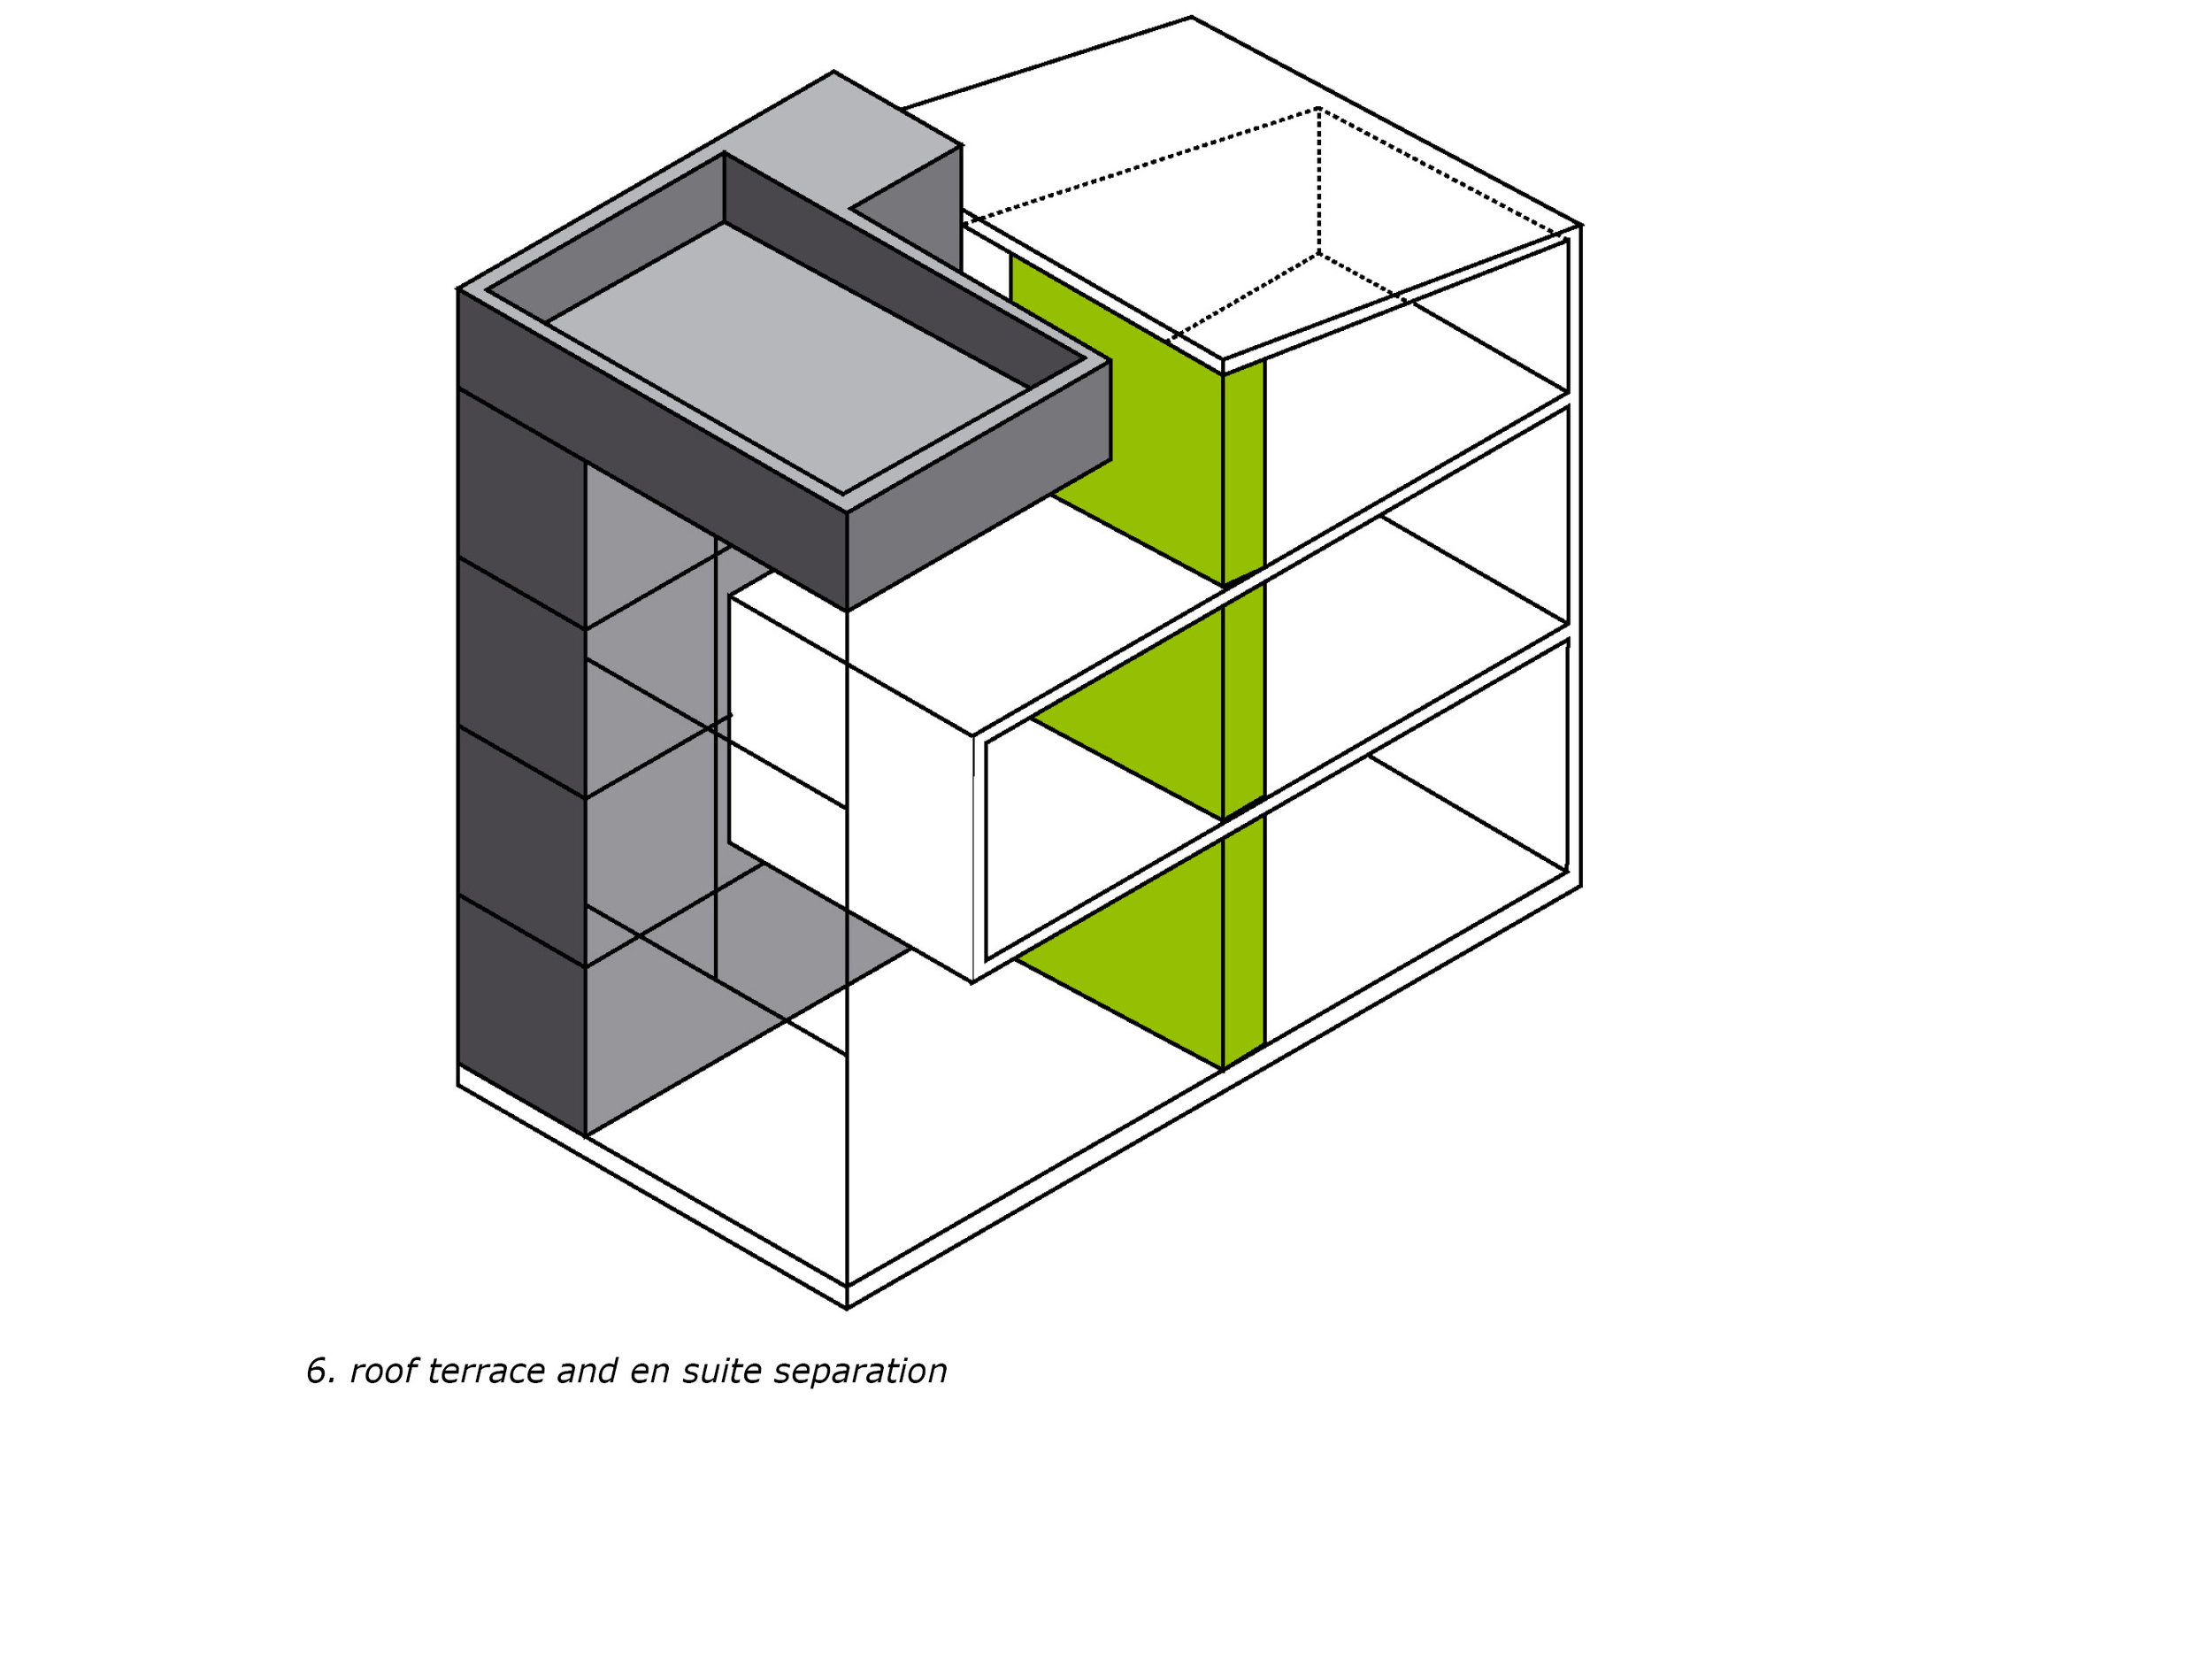 Personal-Architecture-den-haag-woonhuis-2-6.jpg